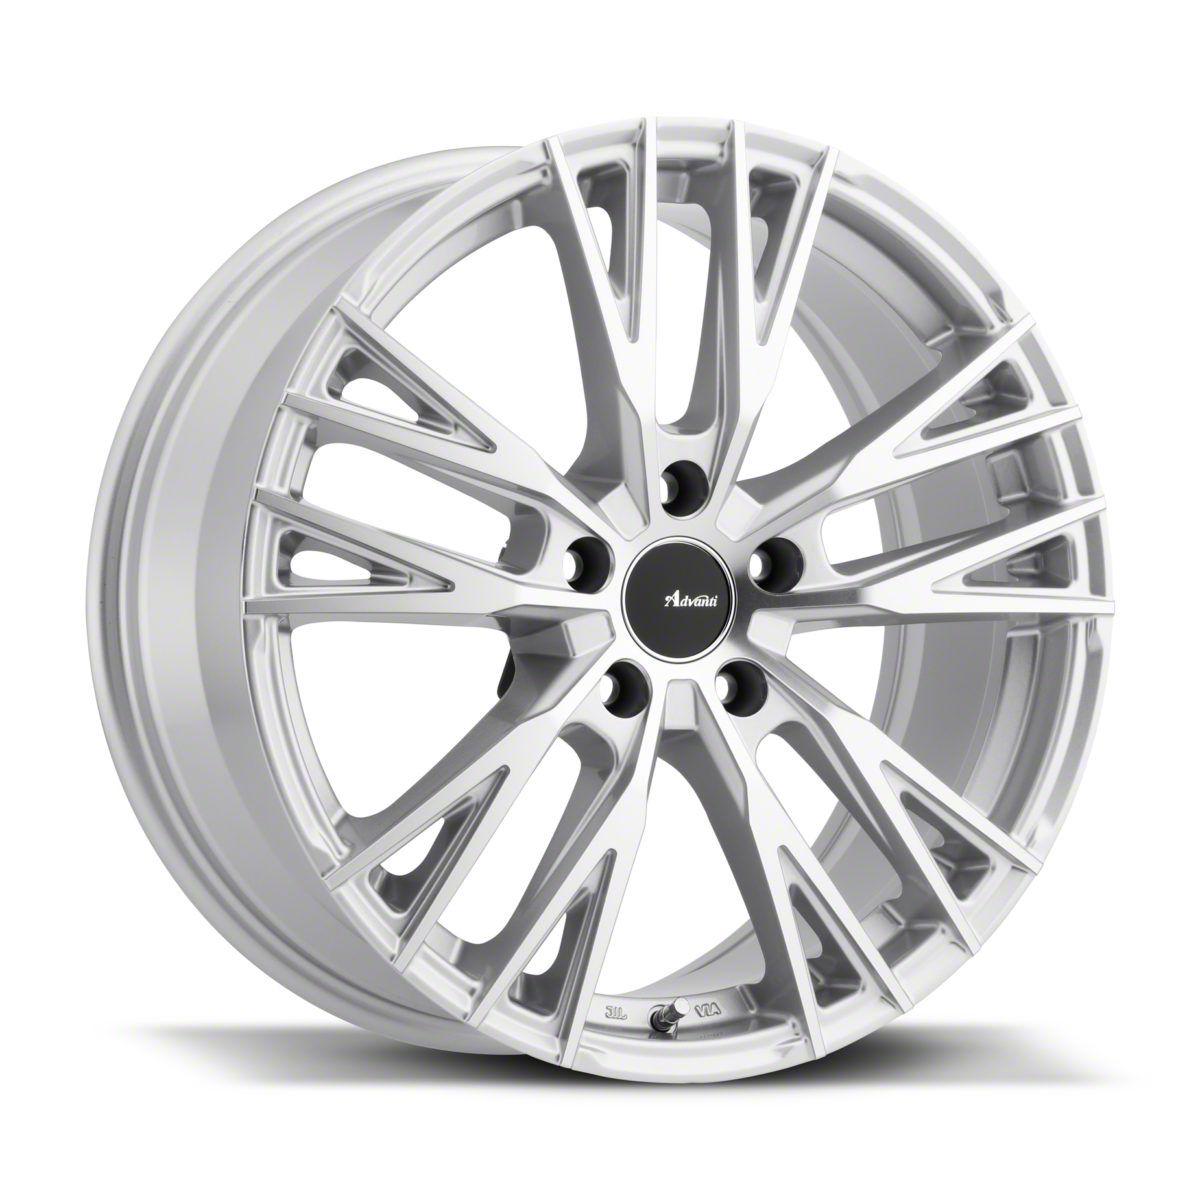 Advanti Forchette Silver w/ Machined Face Wheel - 18x8 (05-14 Standard GT, V6)